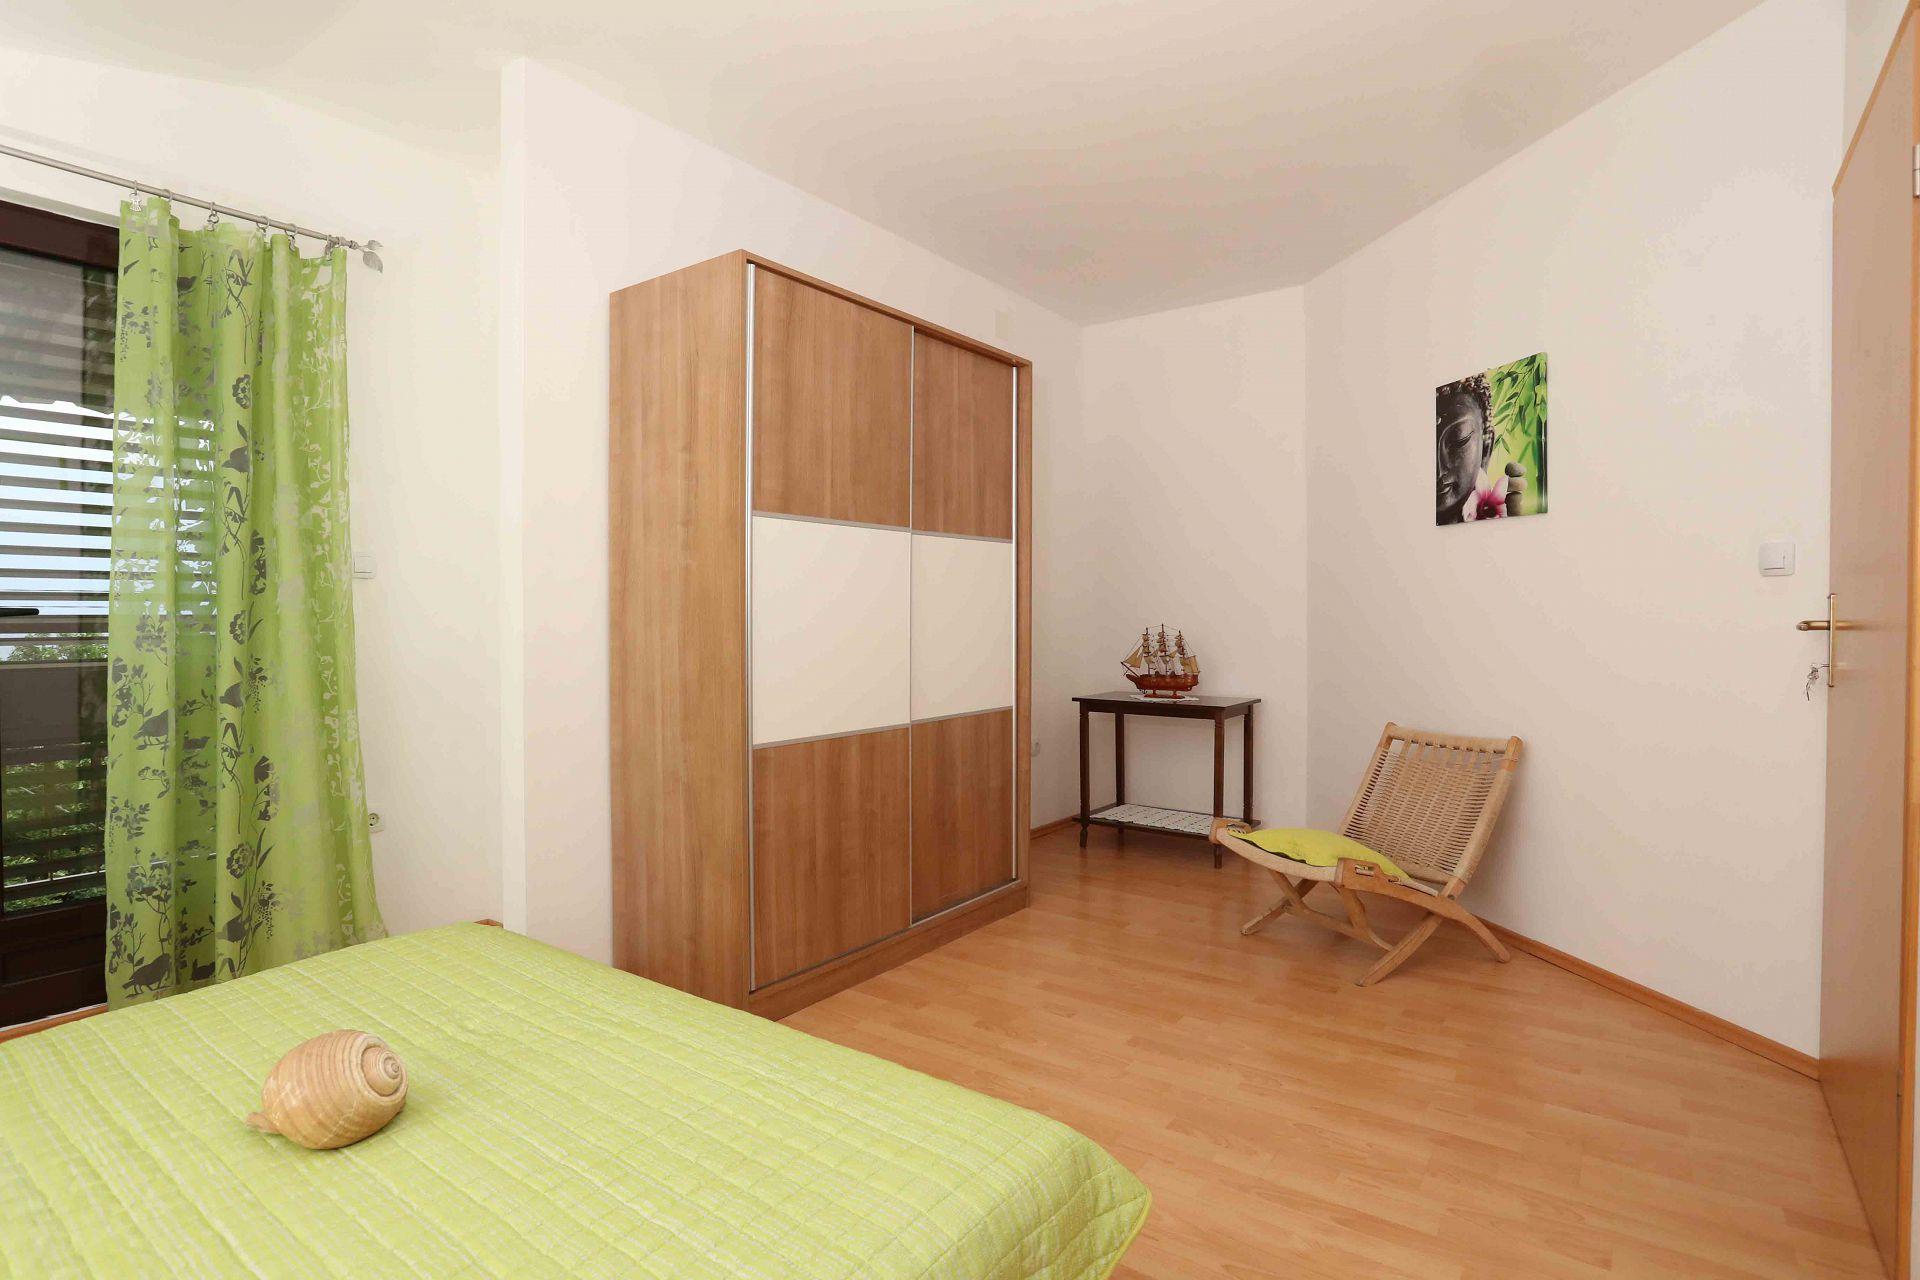 00603ZAVA - Zavala - Appartementen Kroatië - Mario(4+1): slaapkamer